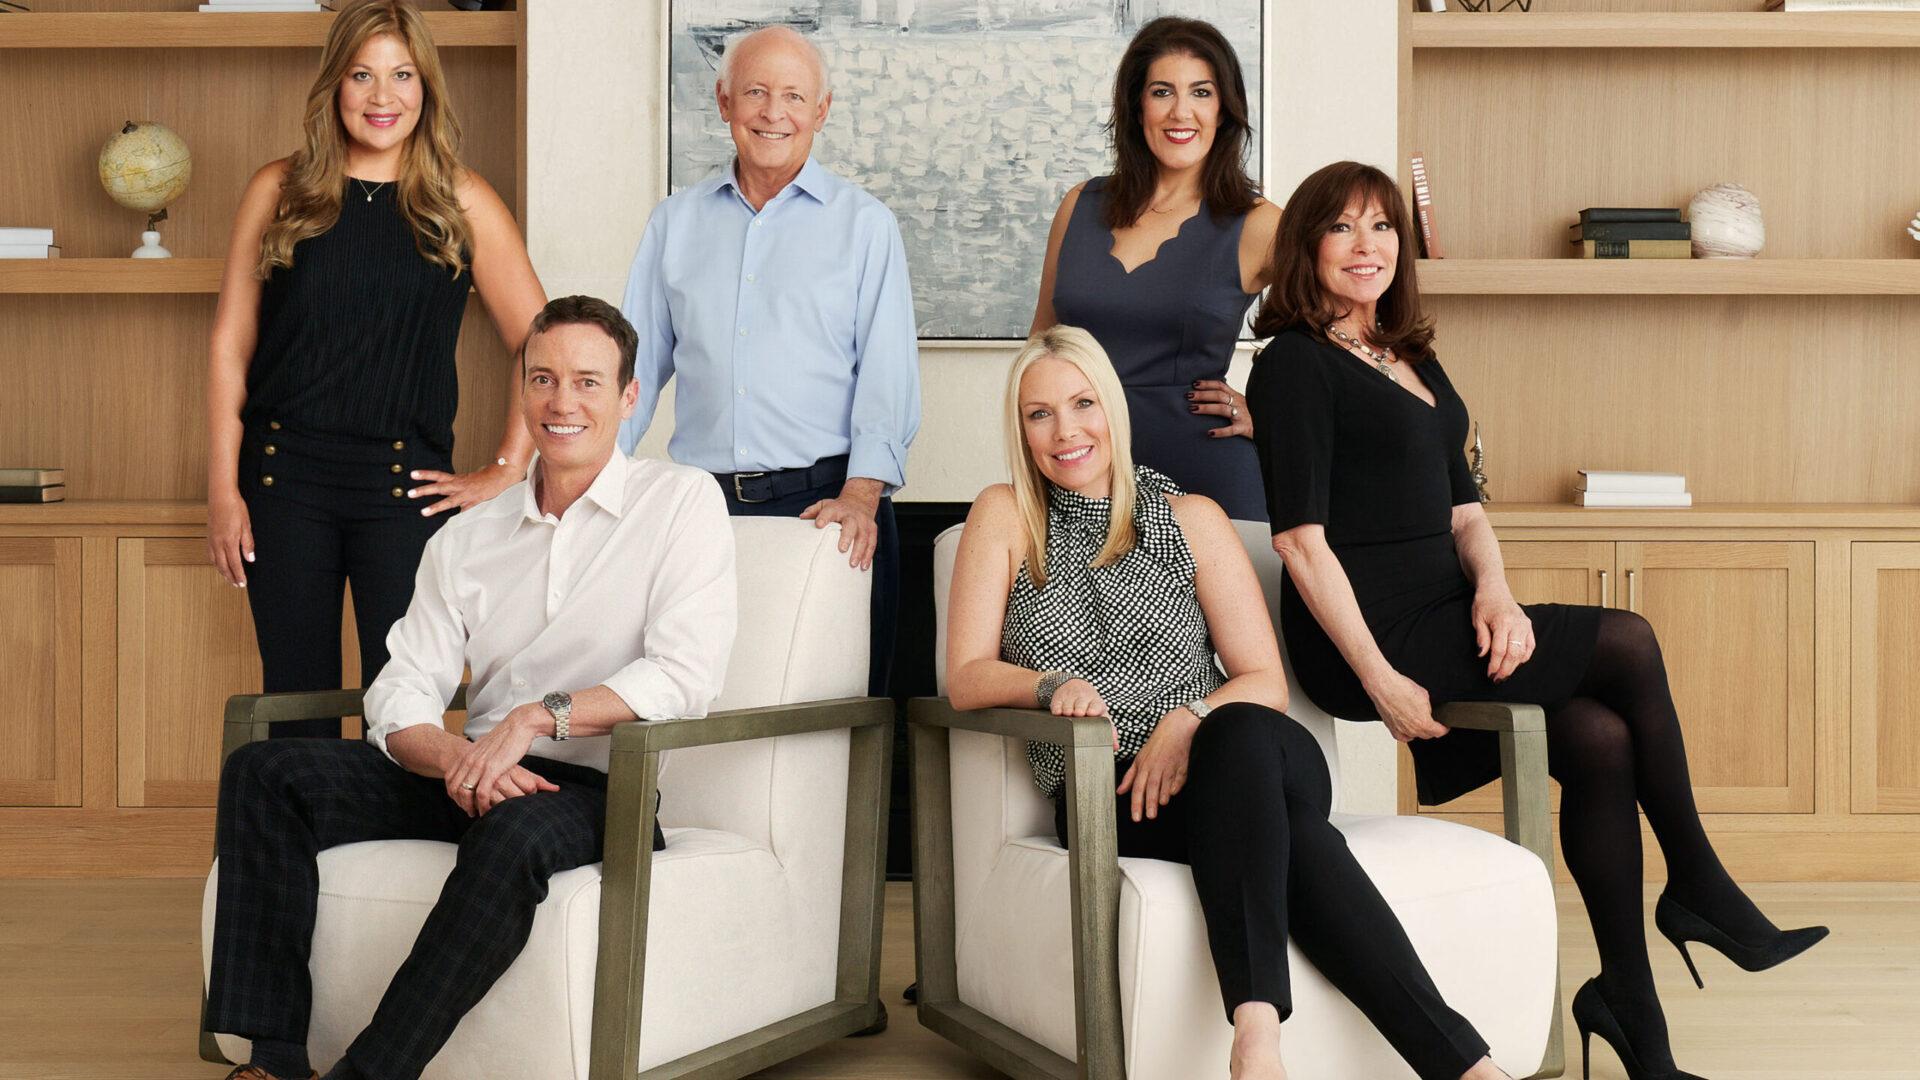 Edlen Team, Michael Edlen, Tatiana Weiss, Christina Wagner, Keith Craven, Jolie Hernandez, top agent, realtor, real estate, realtor team, real estate agent, Pacific Palisades, Santa Monica, Brentwood, Los Angeles, properties